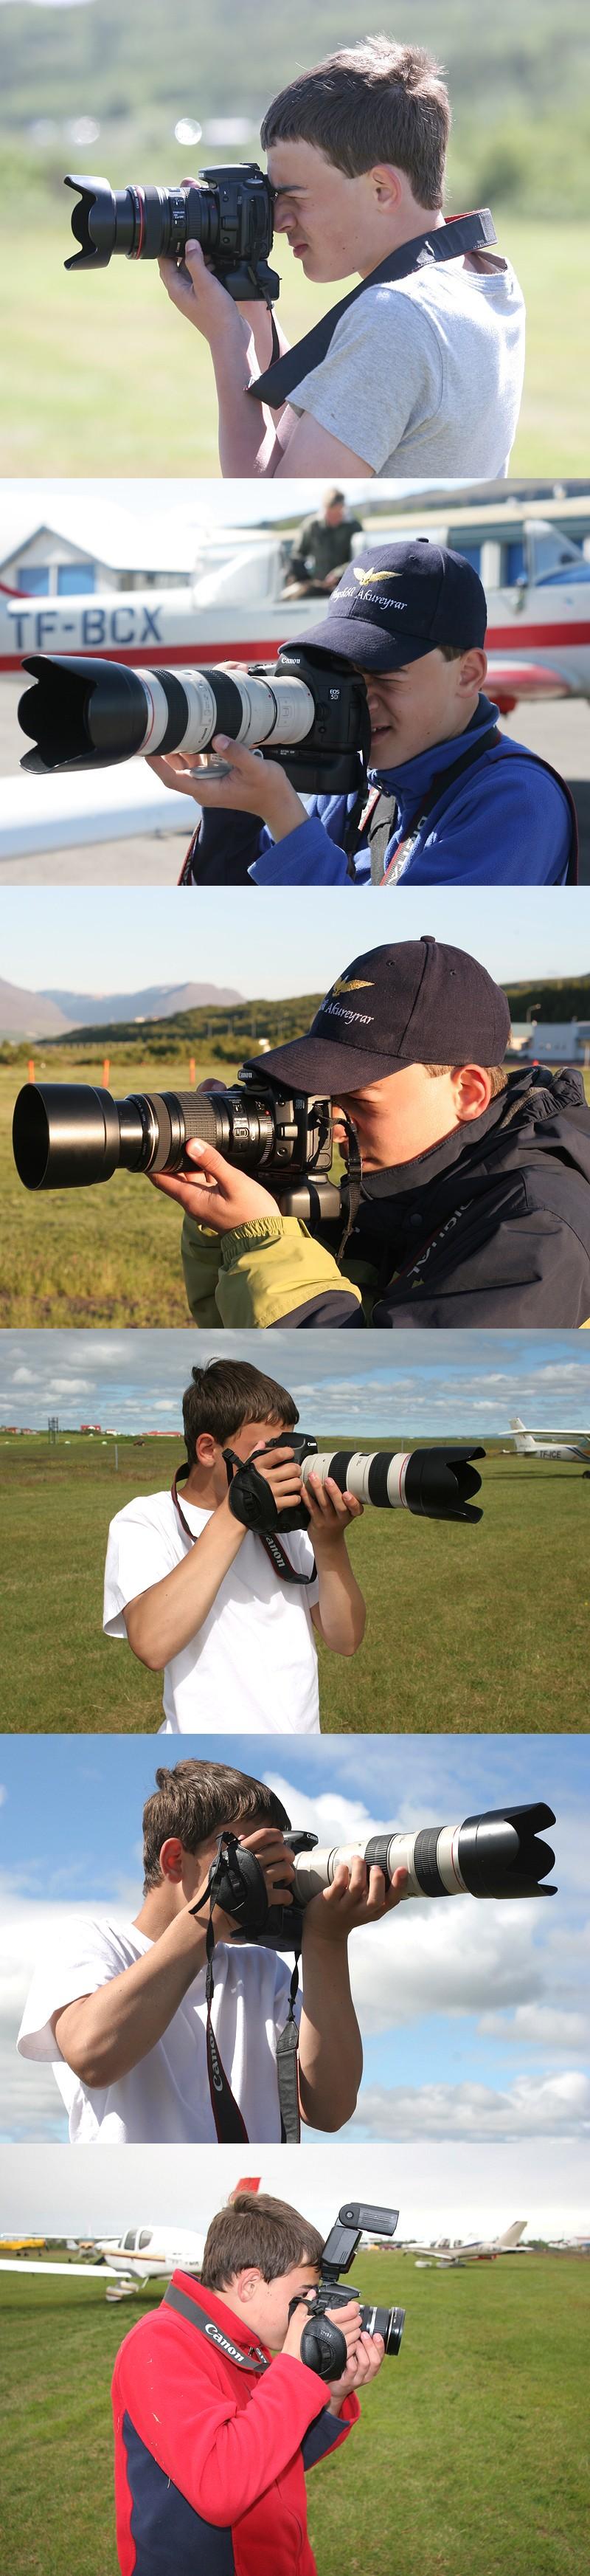 http://asgeir.tristan.is/myndir/dae/dae-shooting.jpg